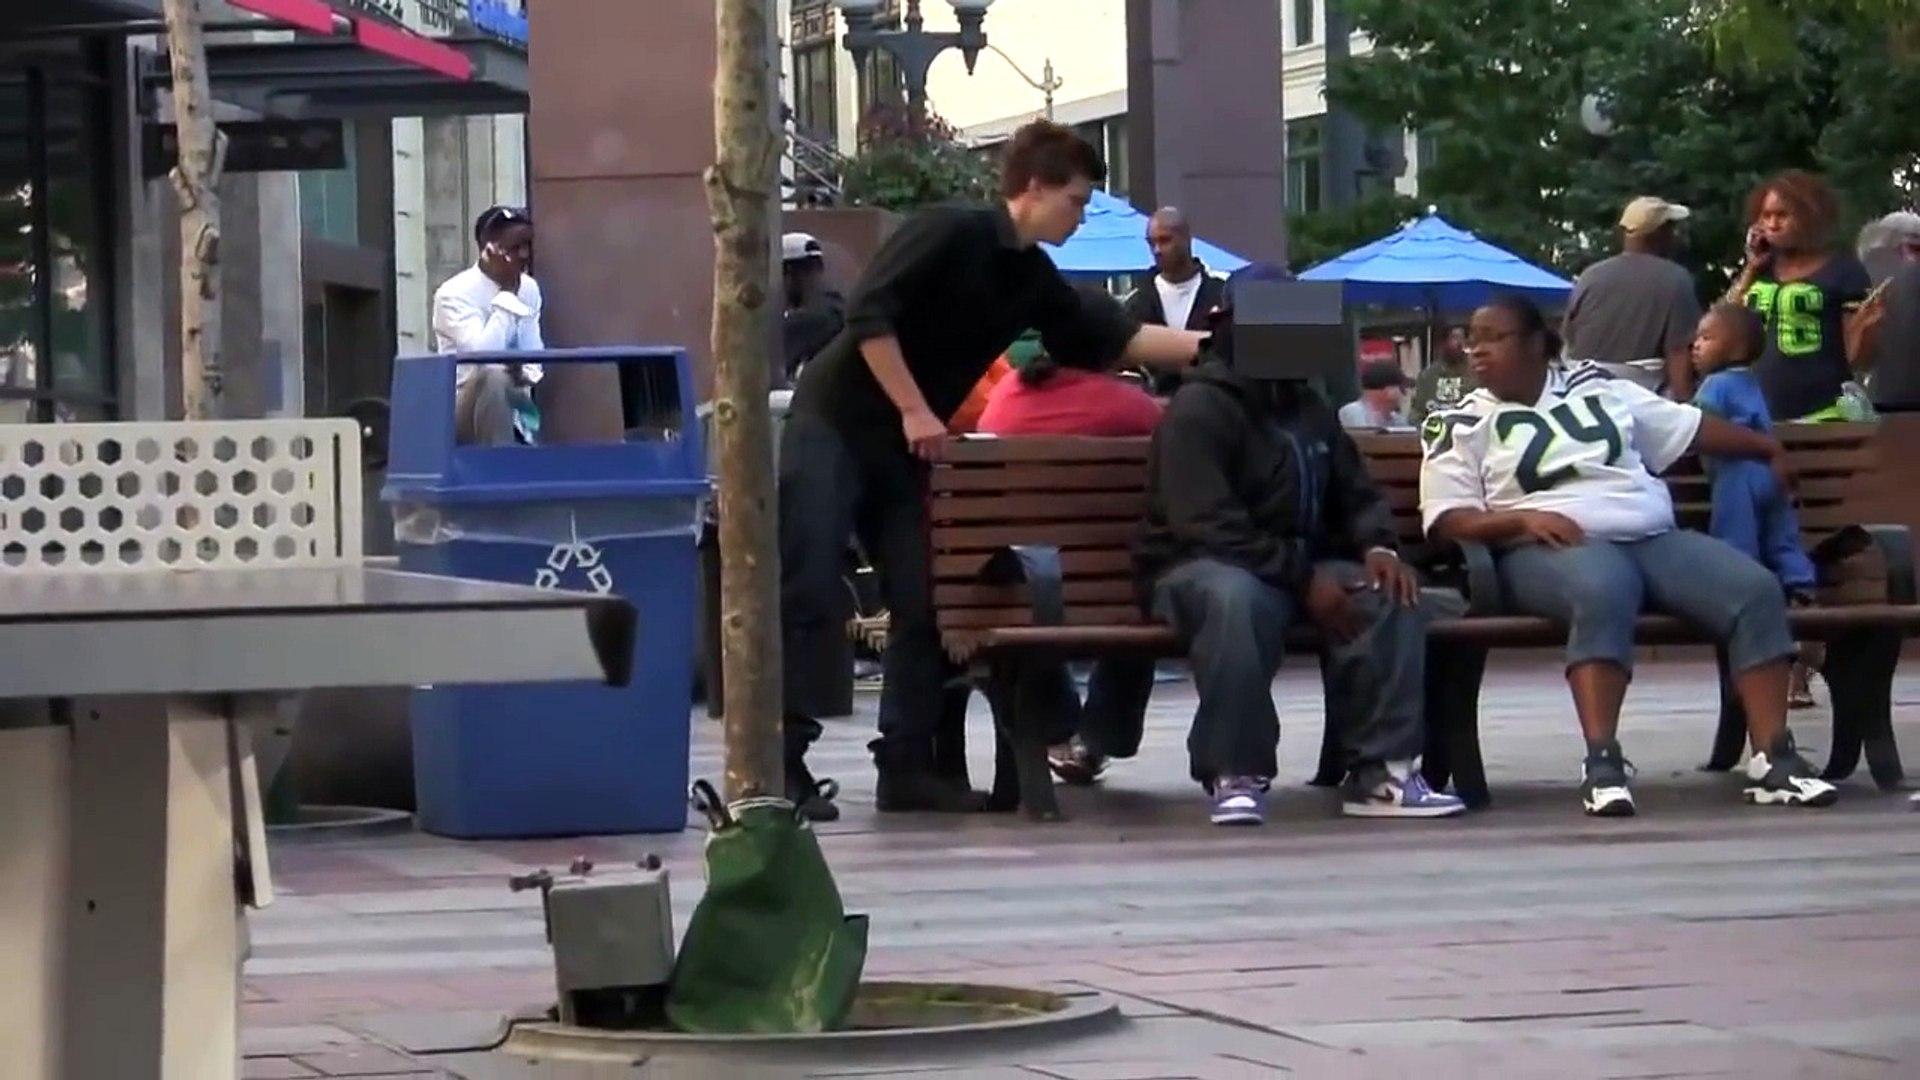 Throwing Condoms at People (PRANKS GONE WRONG) Pranks in the Hood Funny Videos Pranks 2014